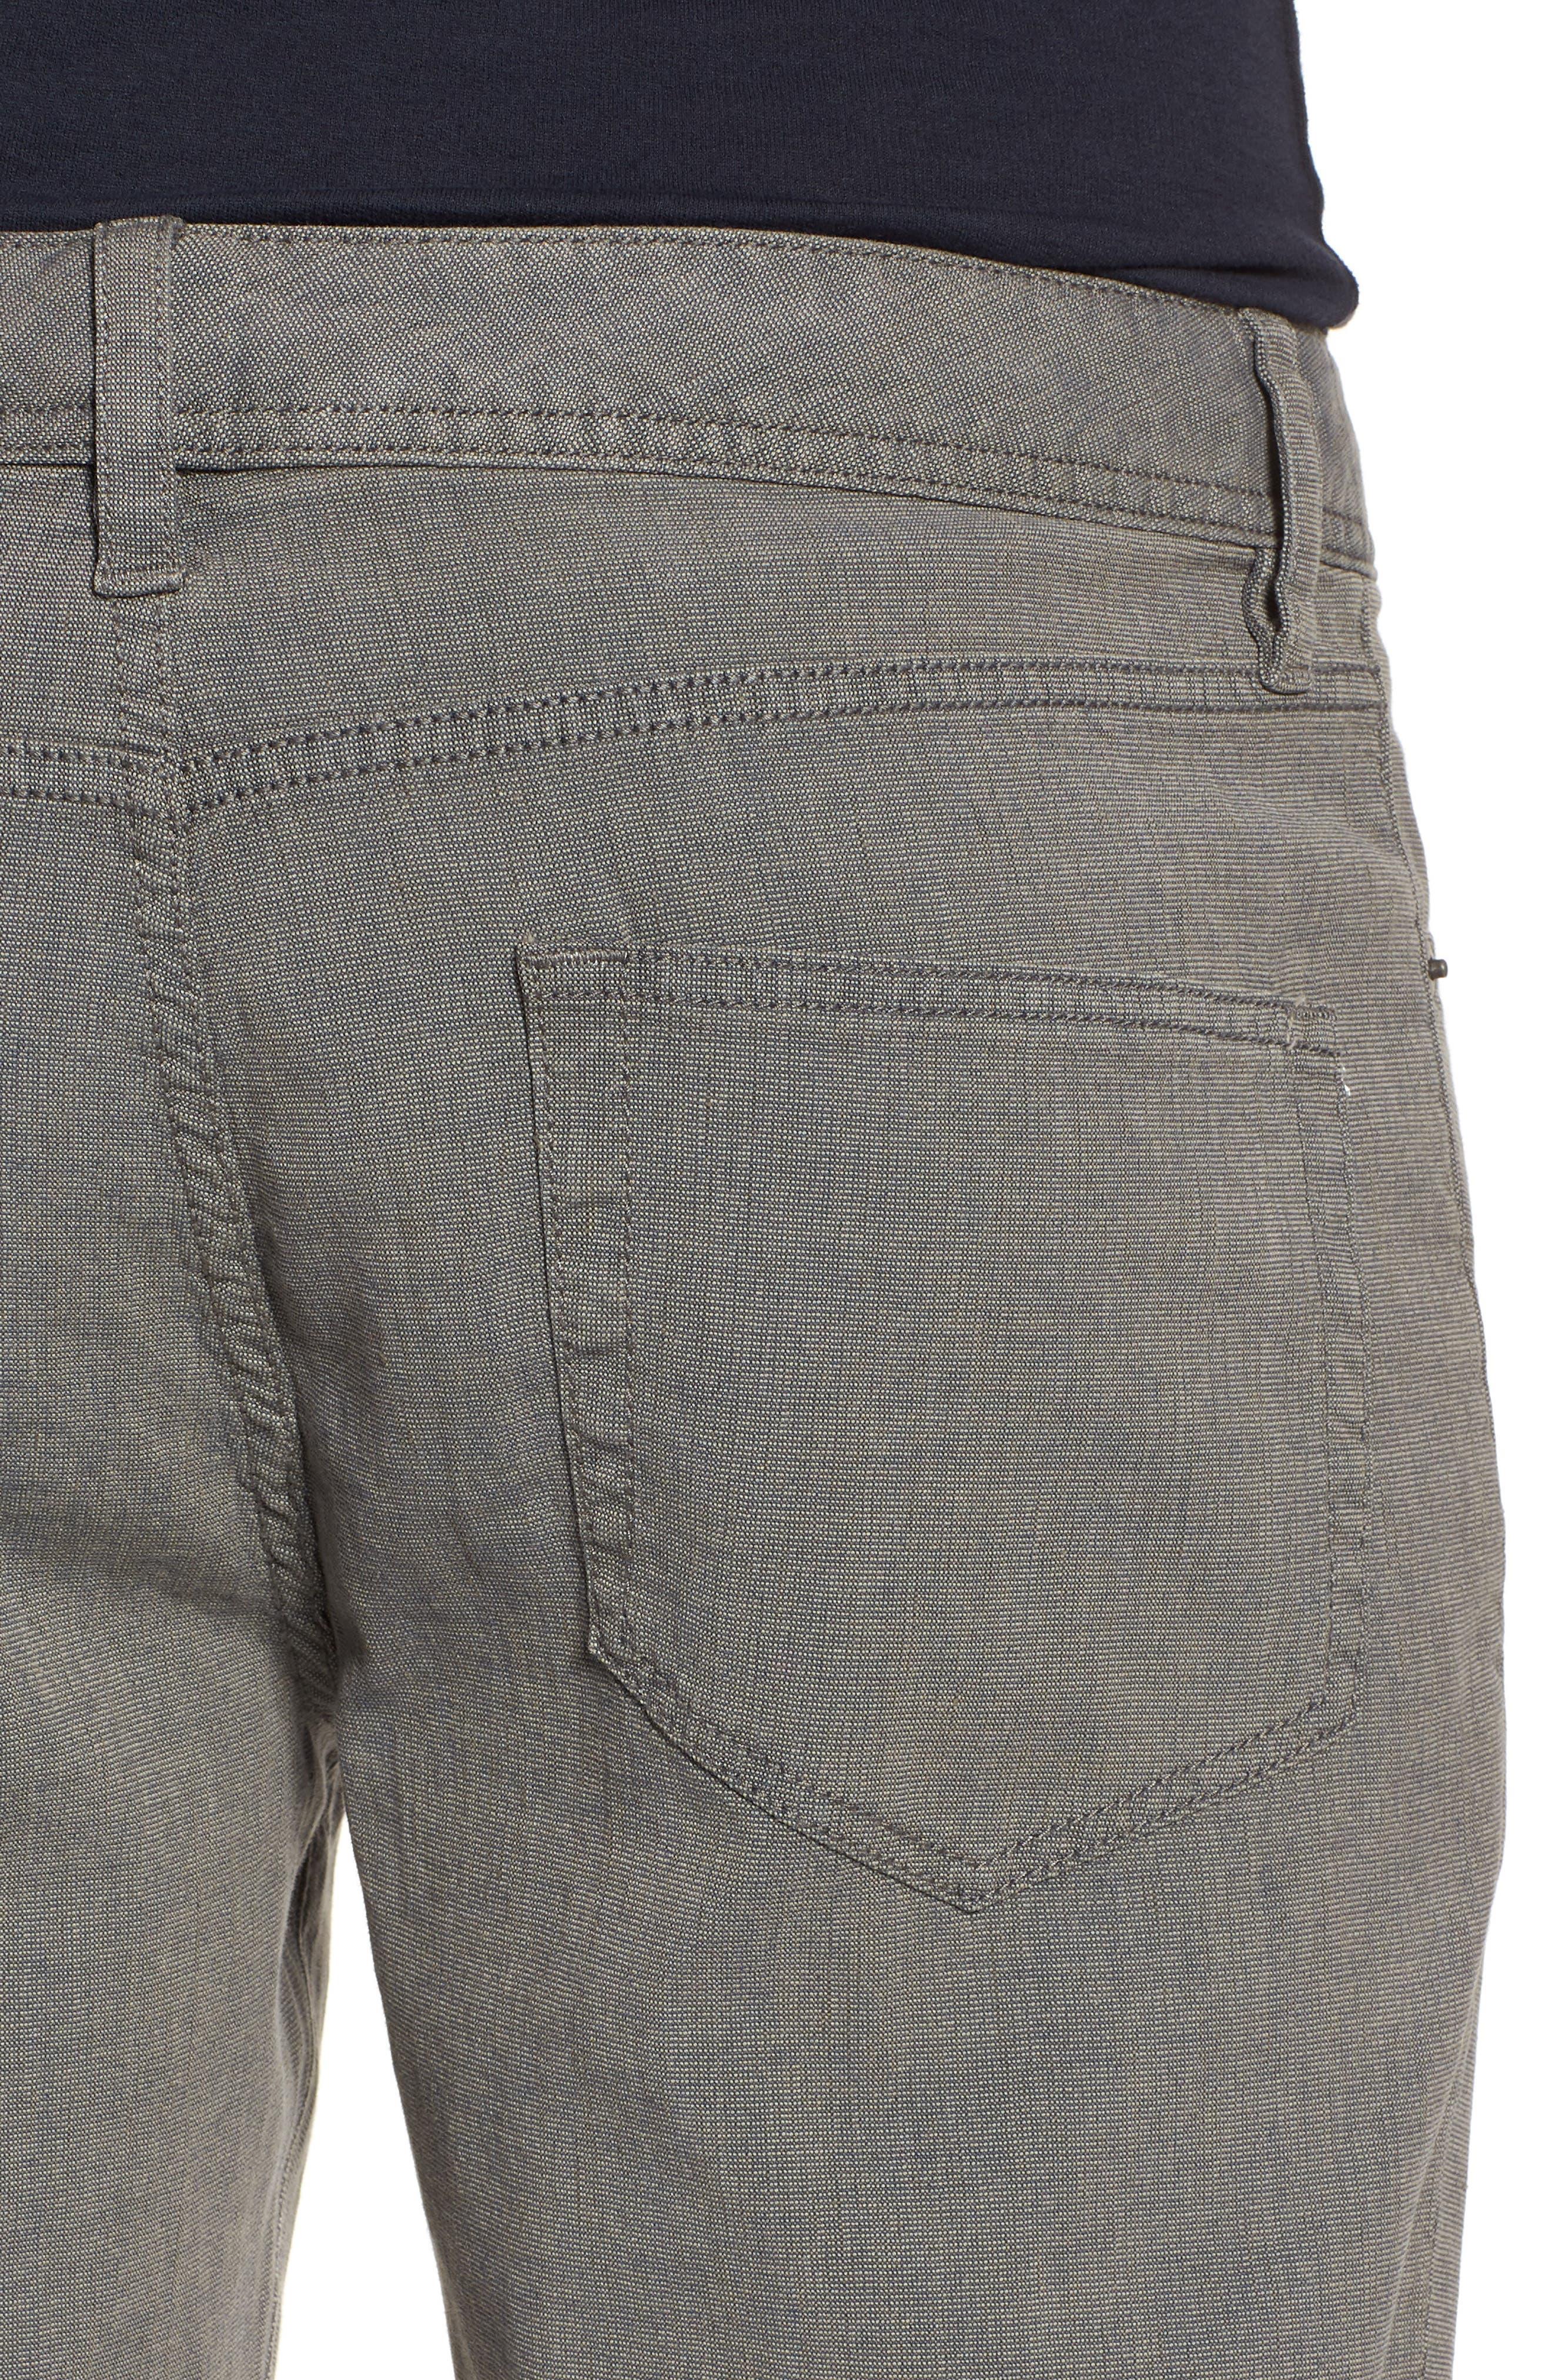 Straight Leg Five-Pocket Pants,                             Alternate thumbnail 4, color,                             Grey